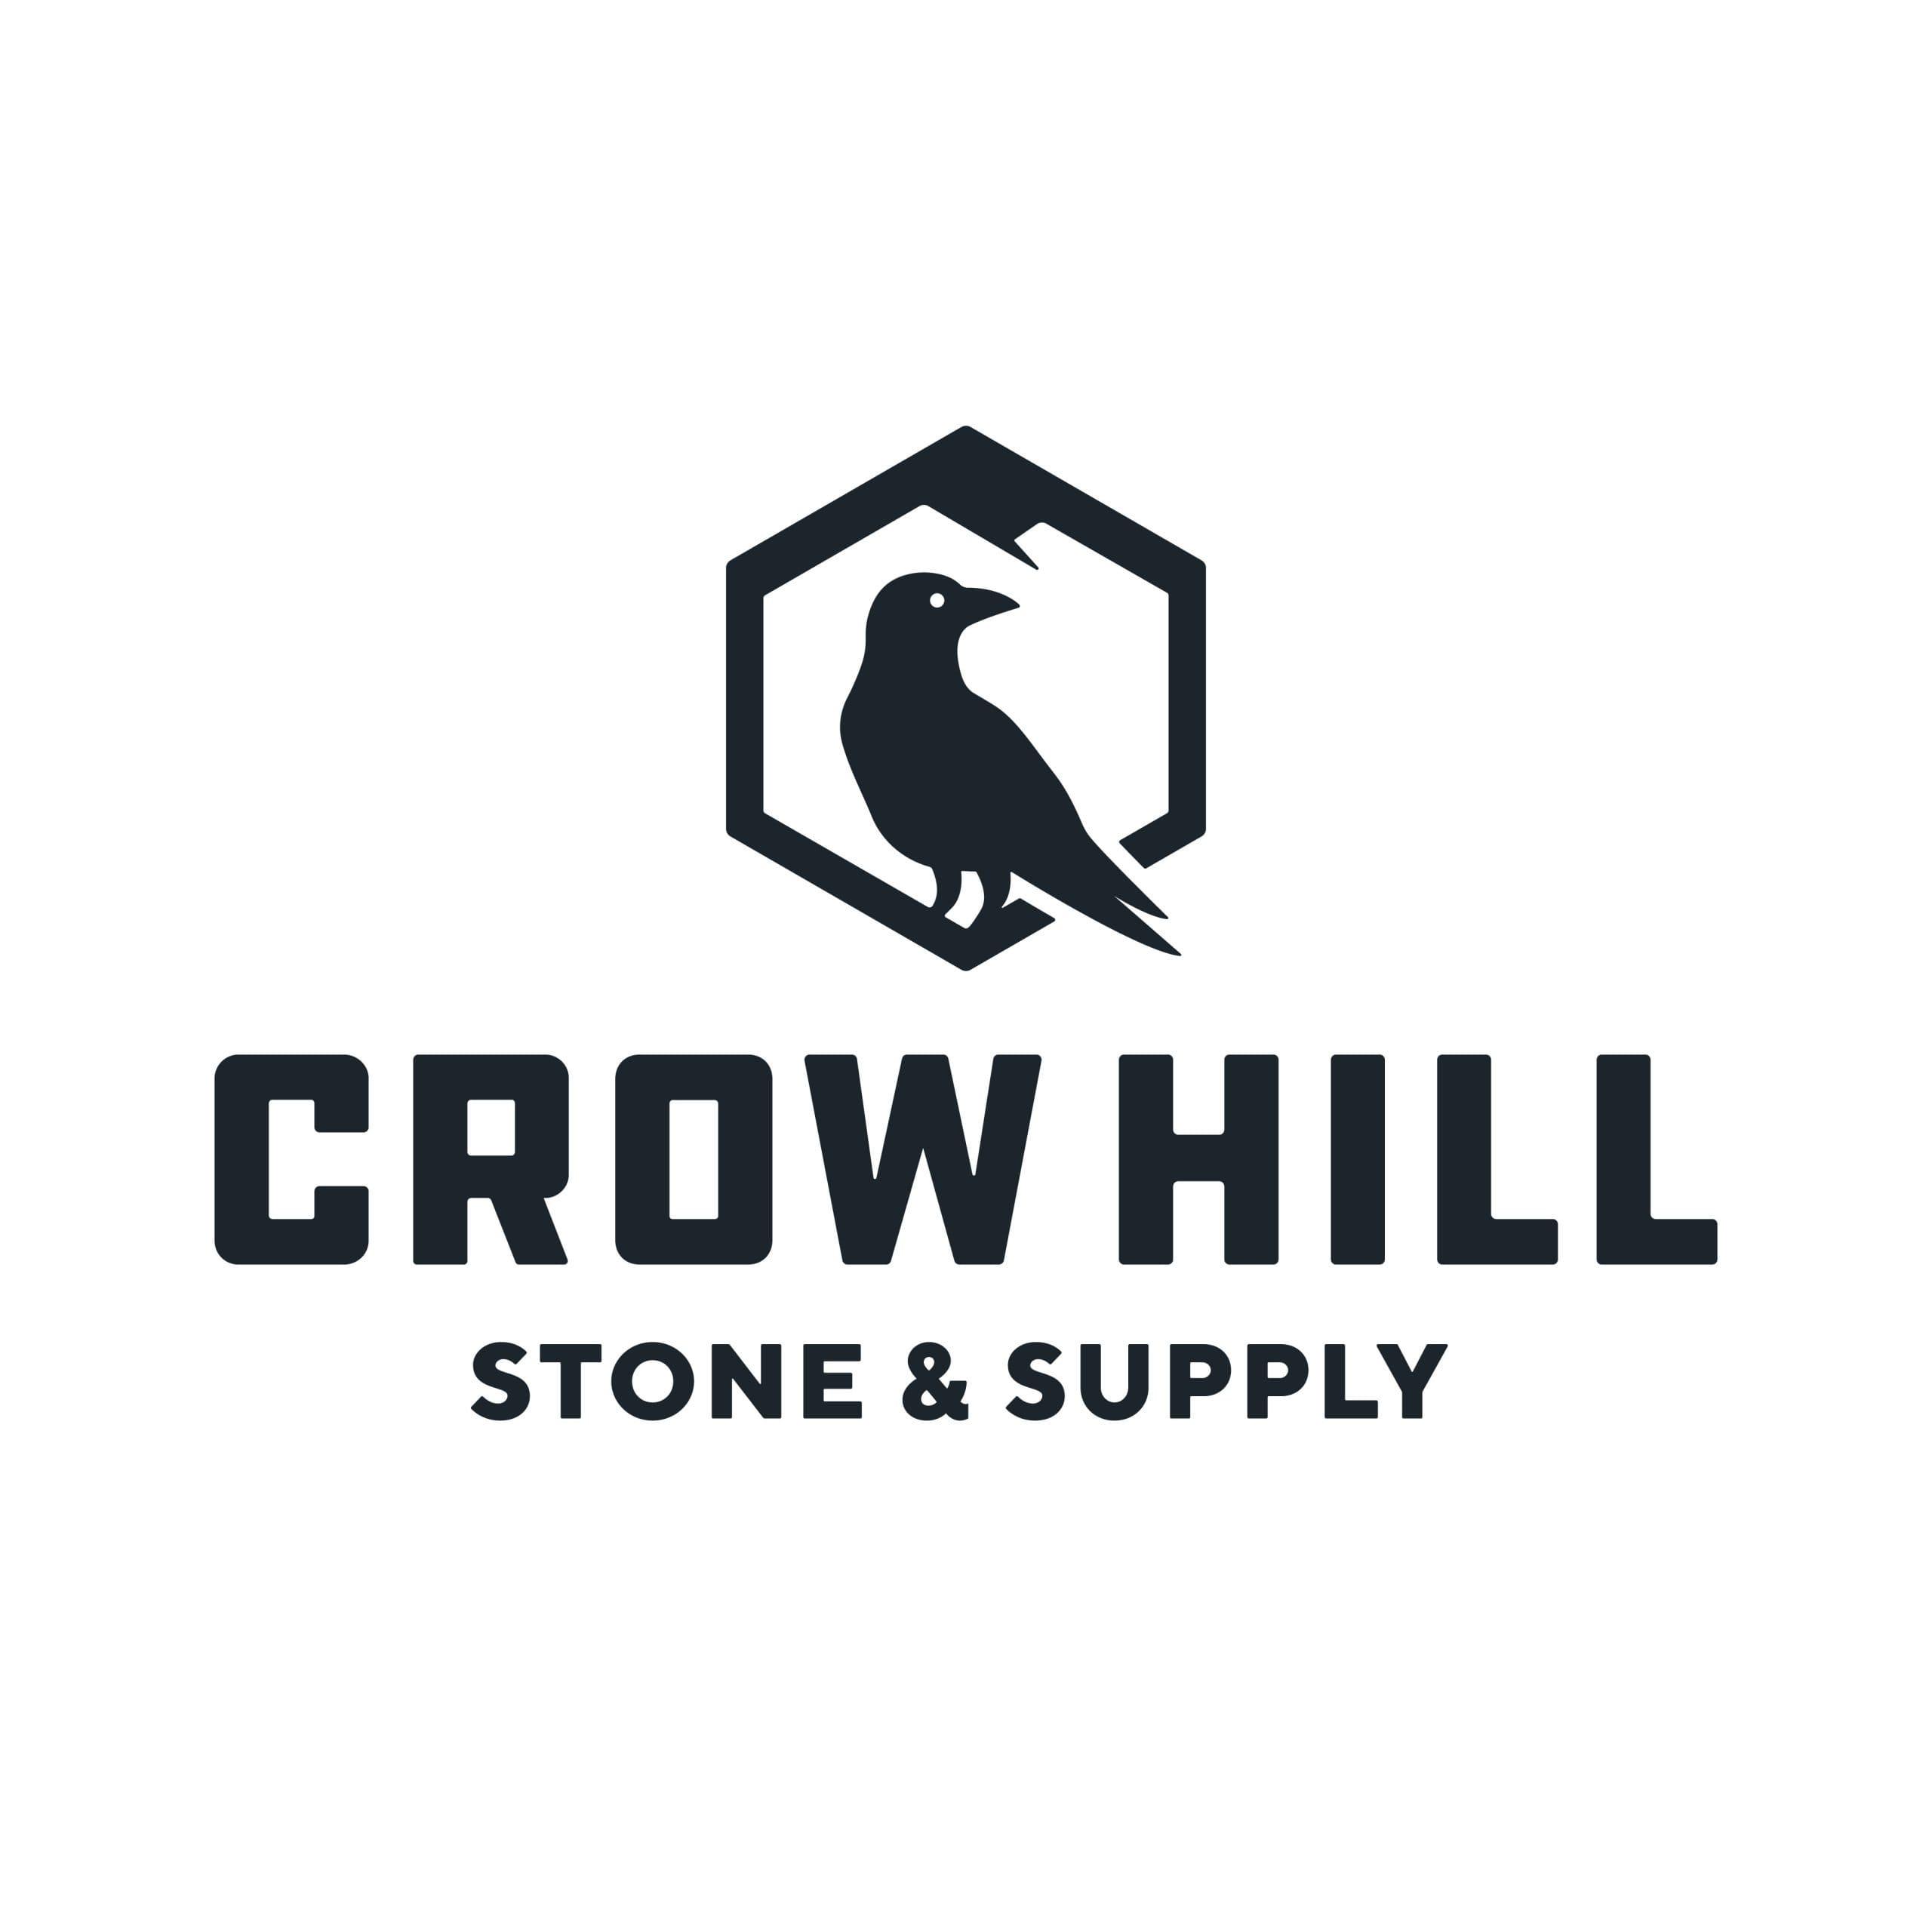 Crow Hill Stone & Supply  Logo Design